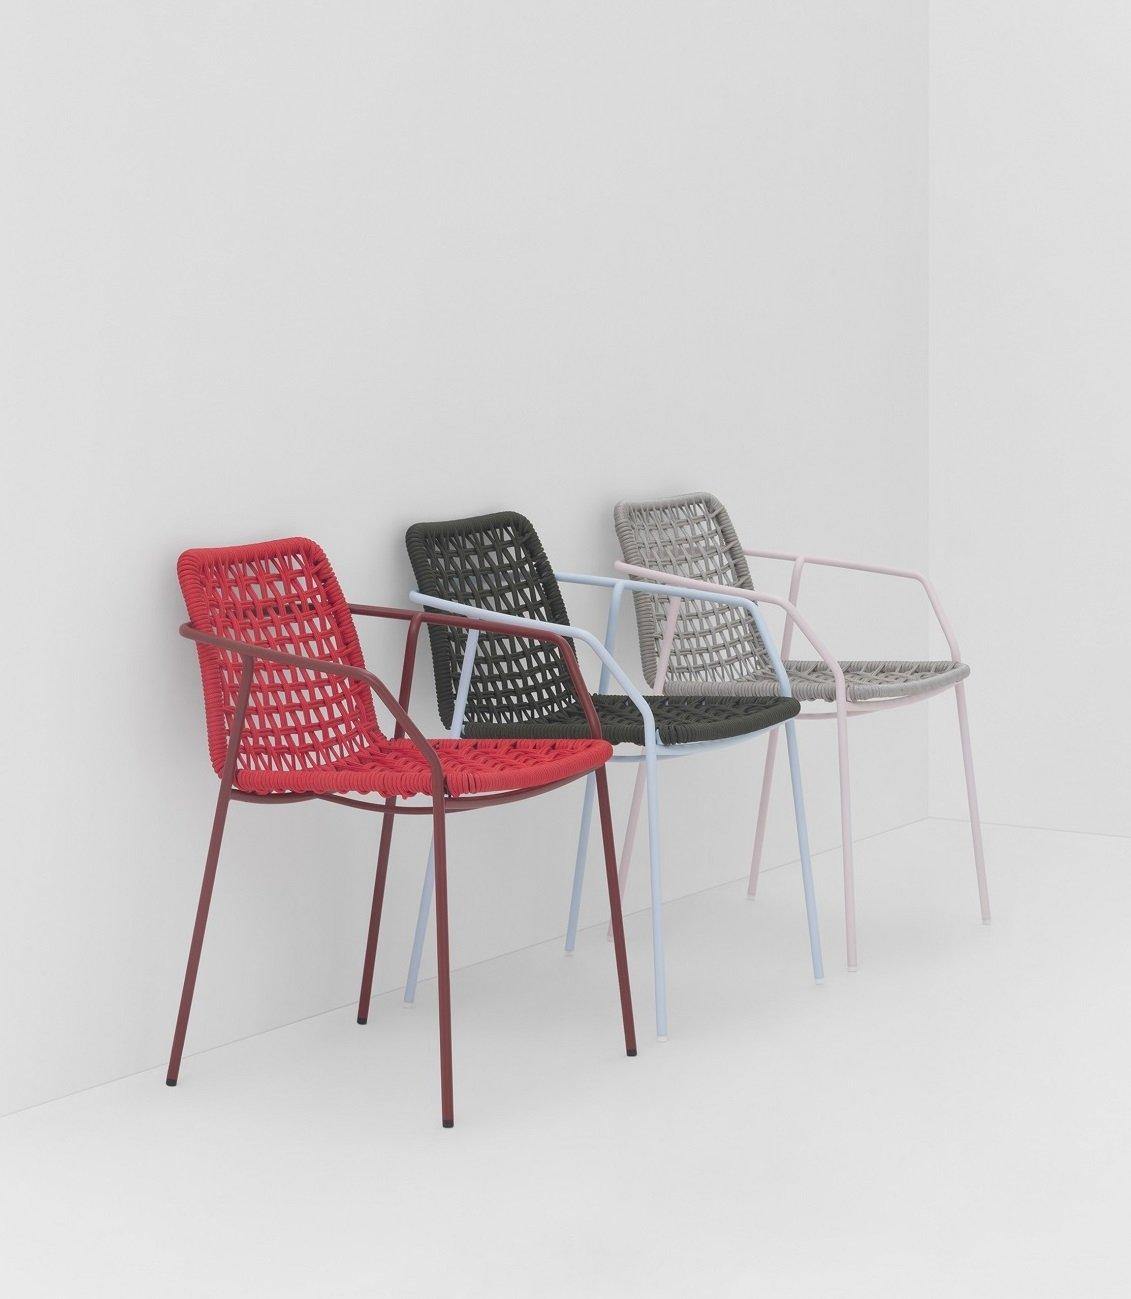 Sey Armchair from Billiani, designed by Emilio Nanni